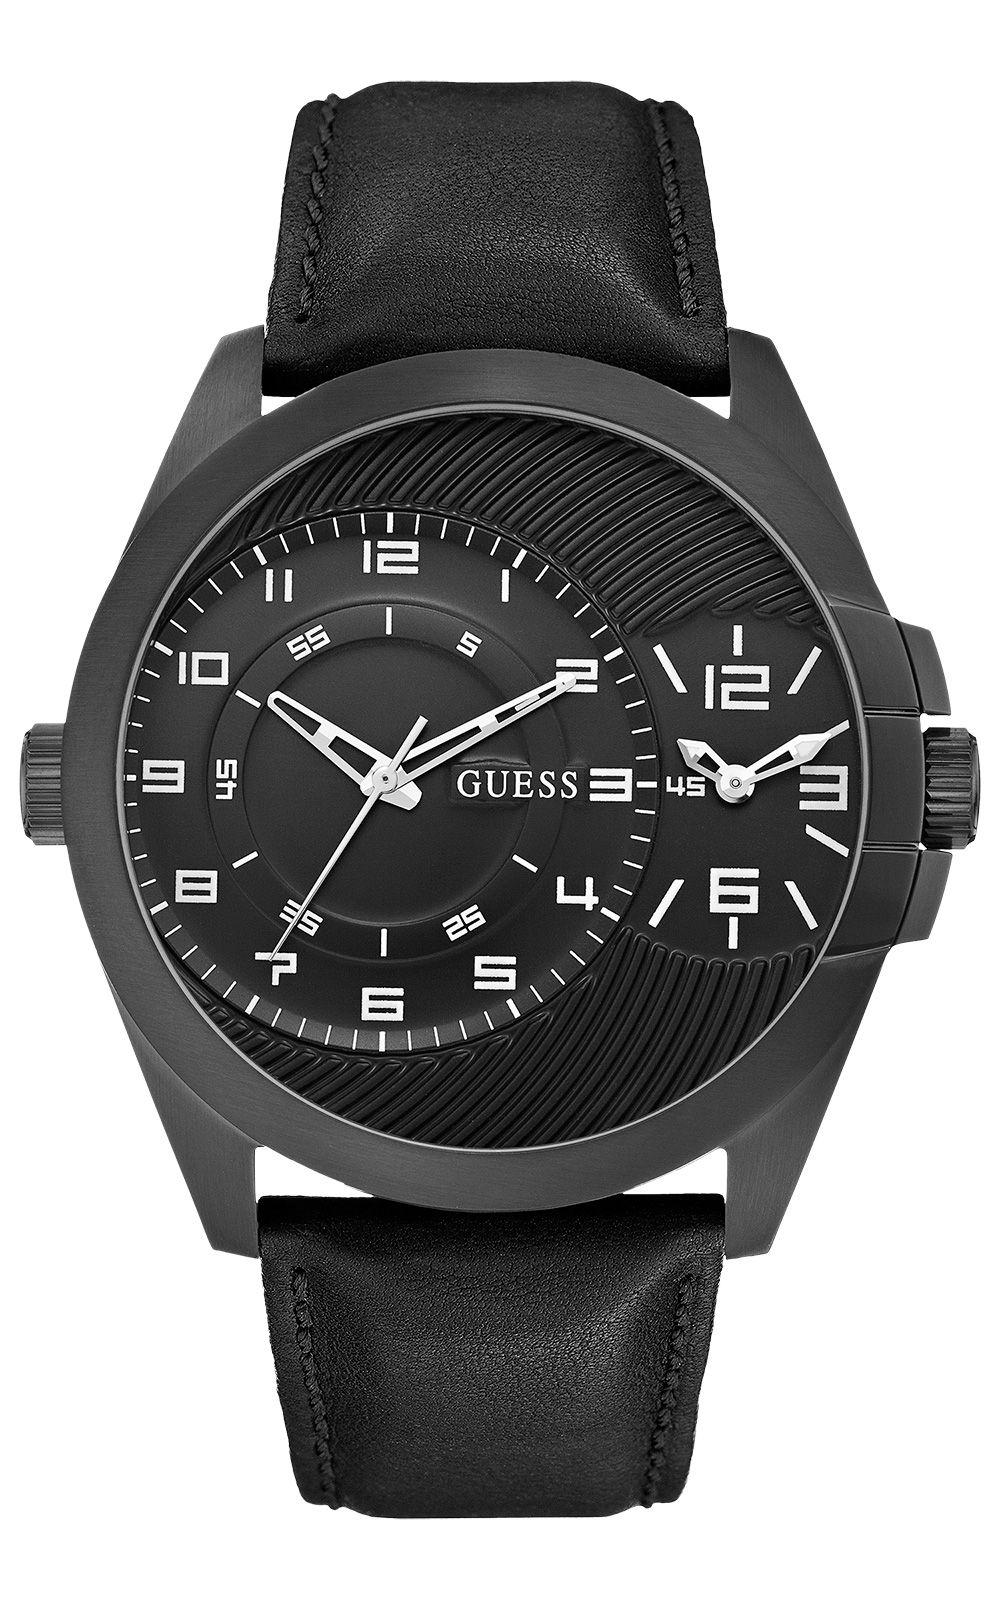 GUESS W0505G5 Ανδρικό Ρολόι Quartz Dual Time 7b0b56188a0